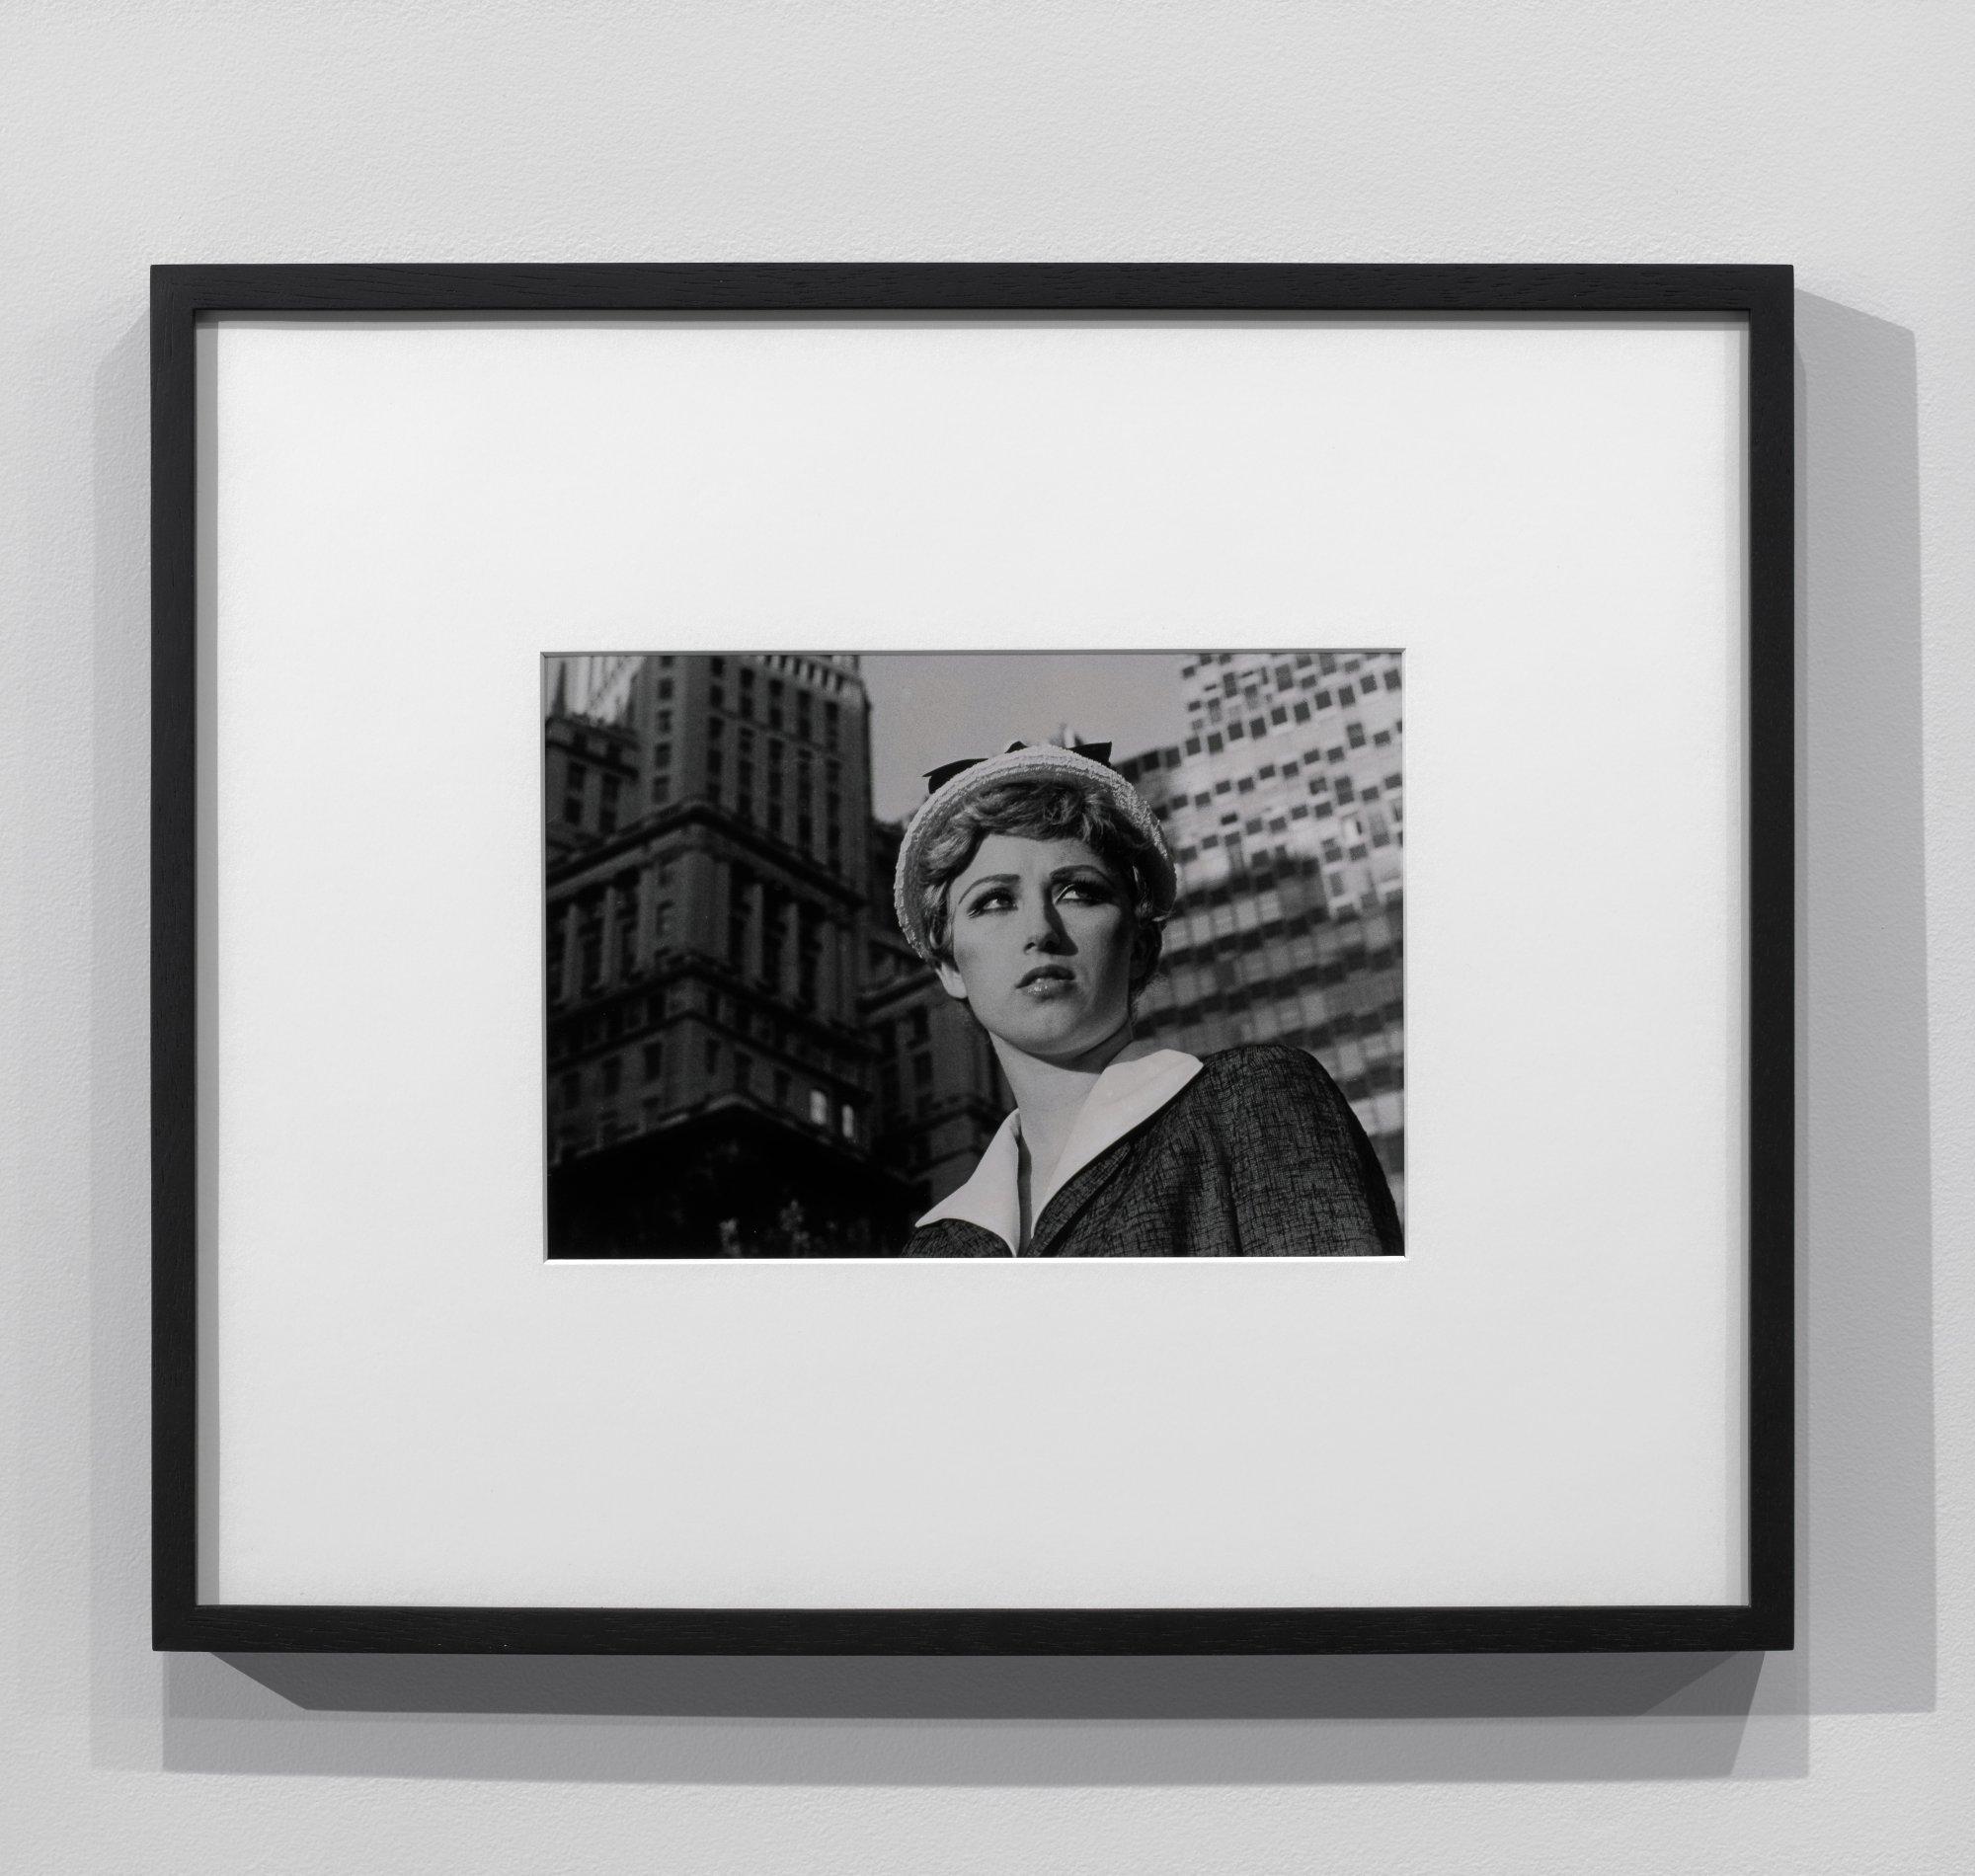 Bourse Museum Paris. Cindy Sherman, Untitled Film Still #21, 1979.